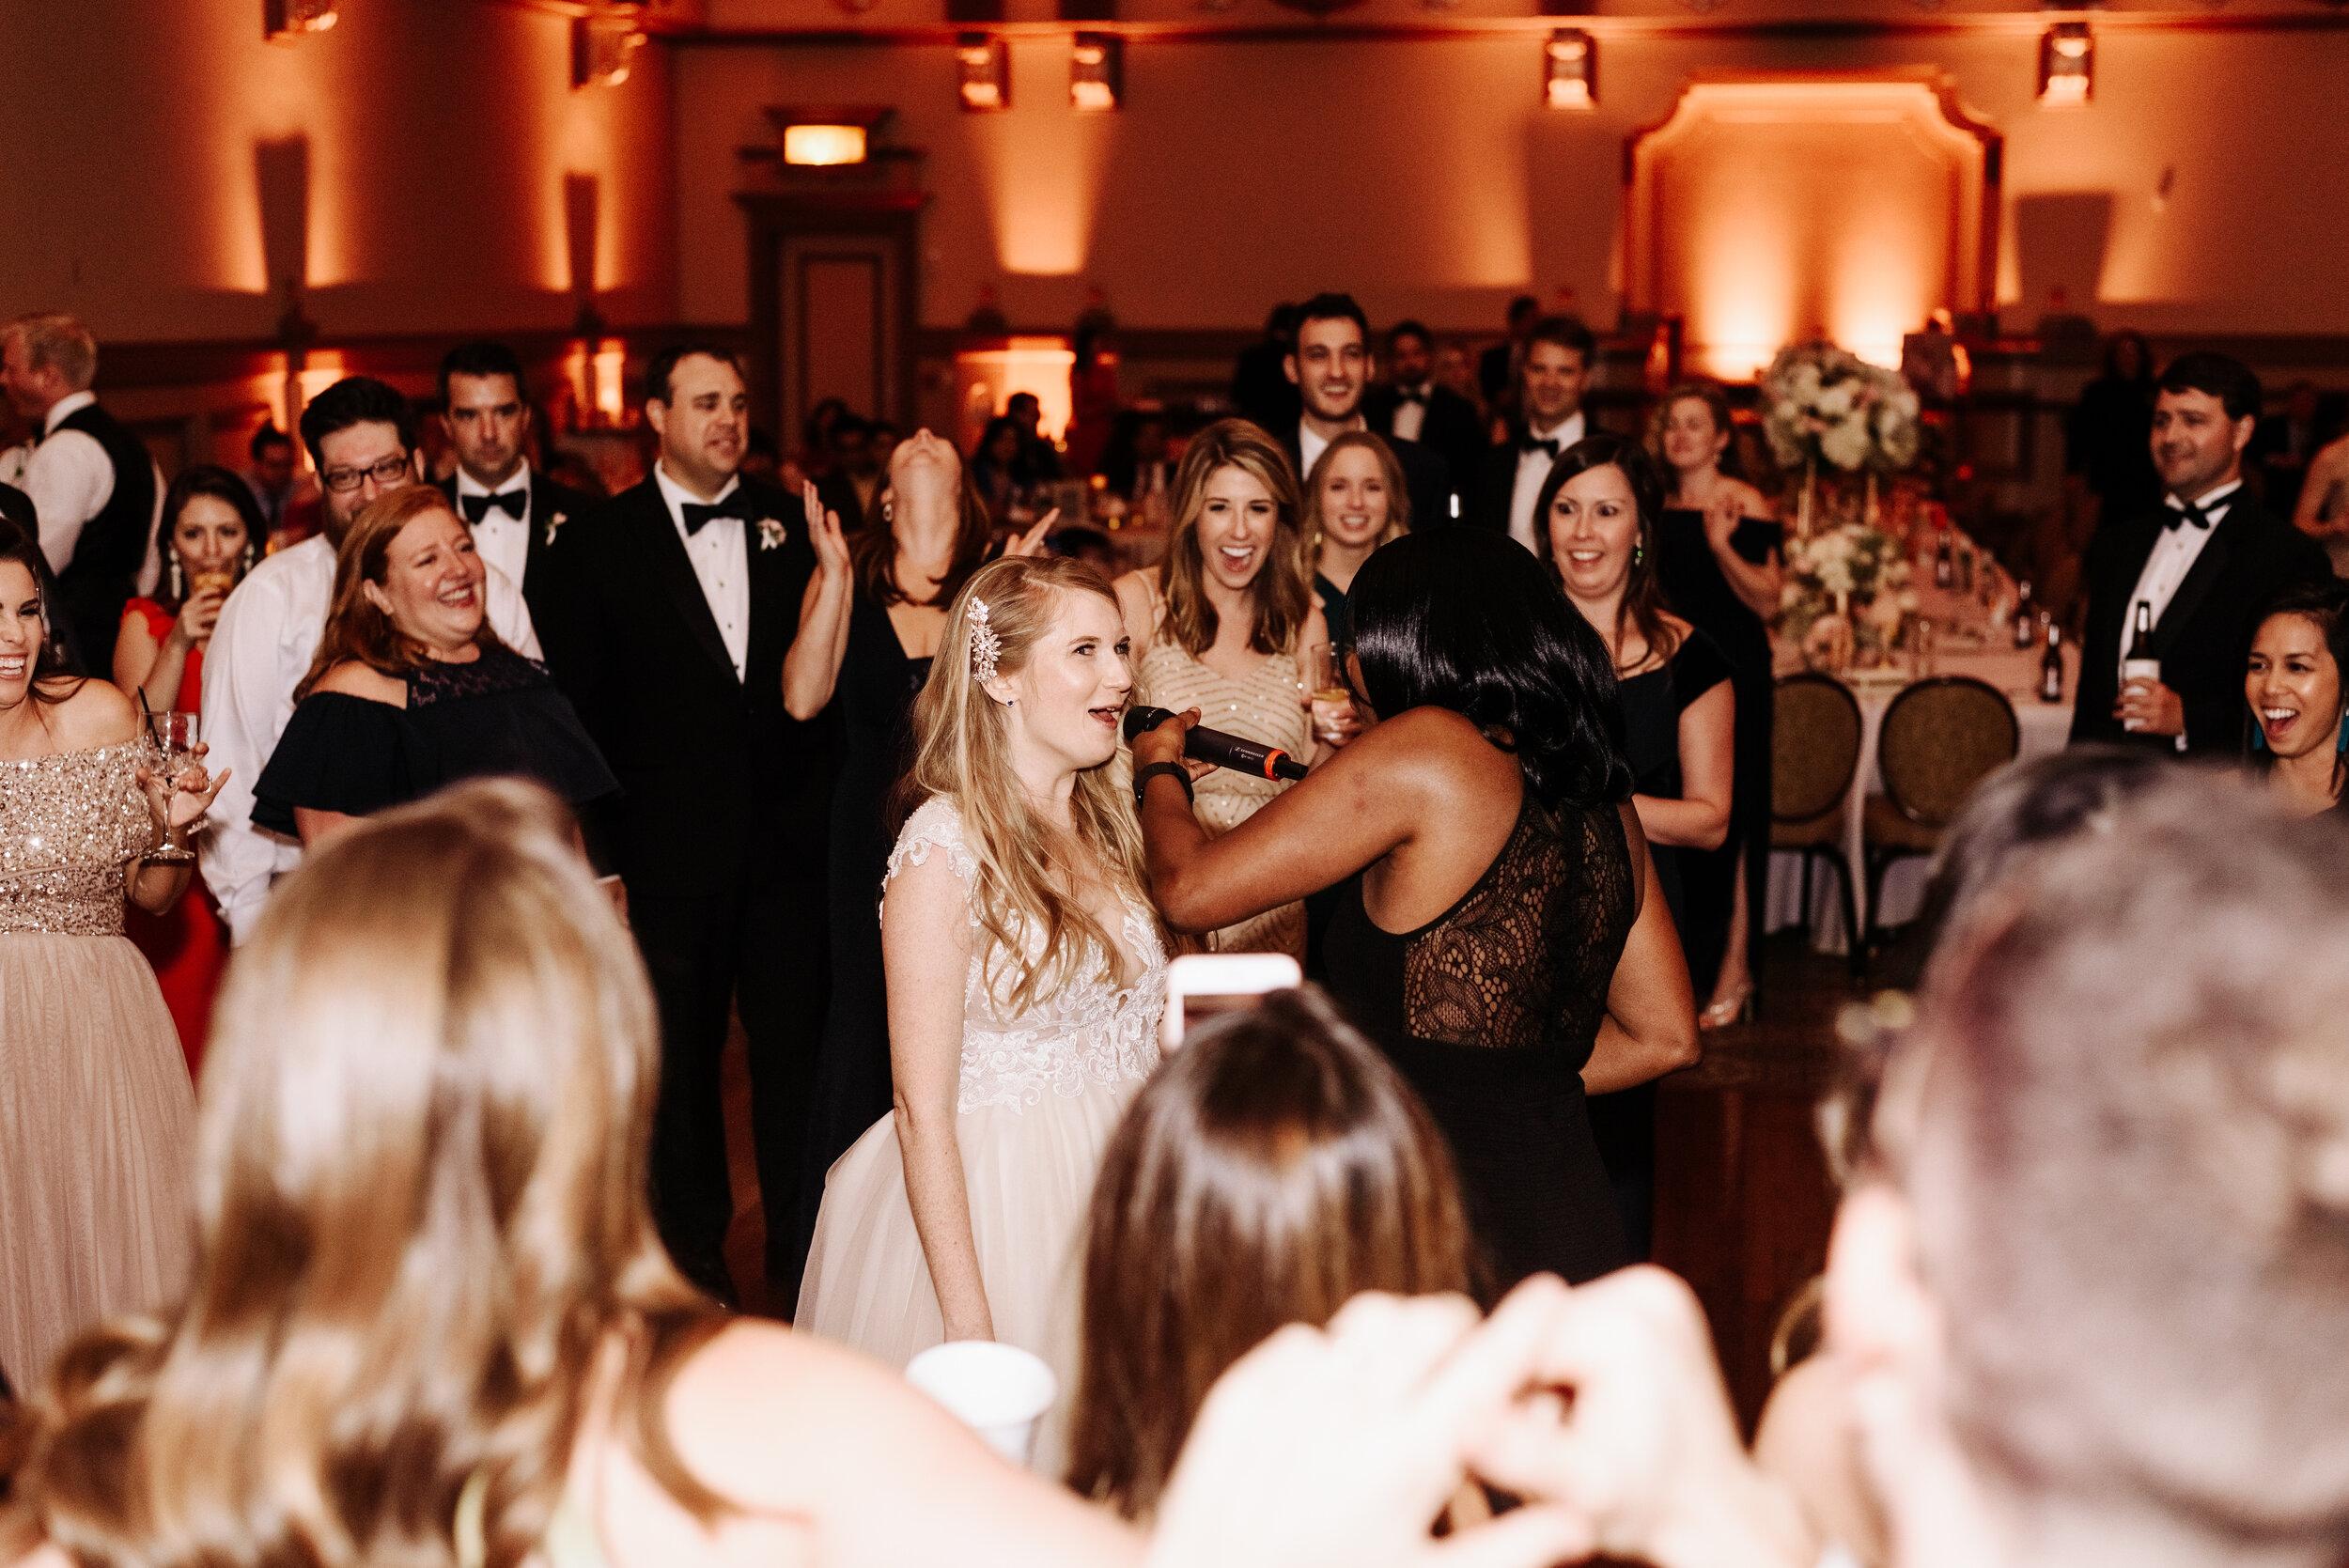 Cassie-Mrunal-Wedding-Quirk-Hotel-John-Marshall-Ballrooms-Richmond-Virginia-Photography-by-V-111.jpg